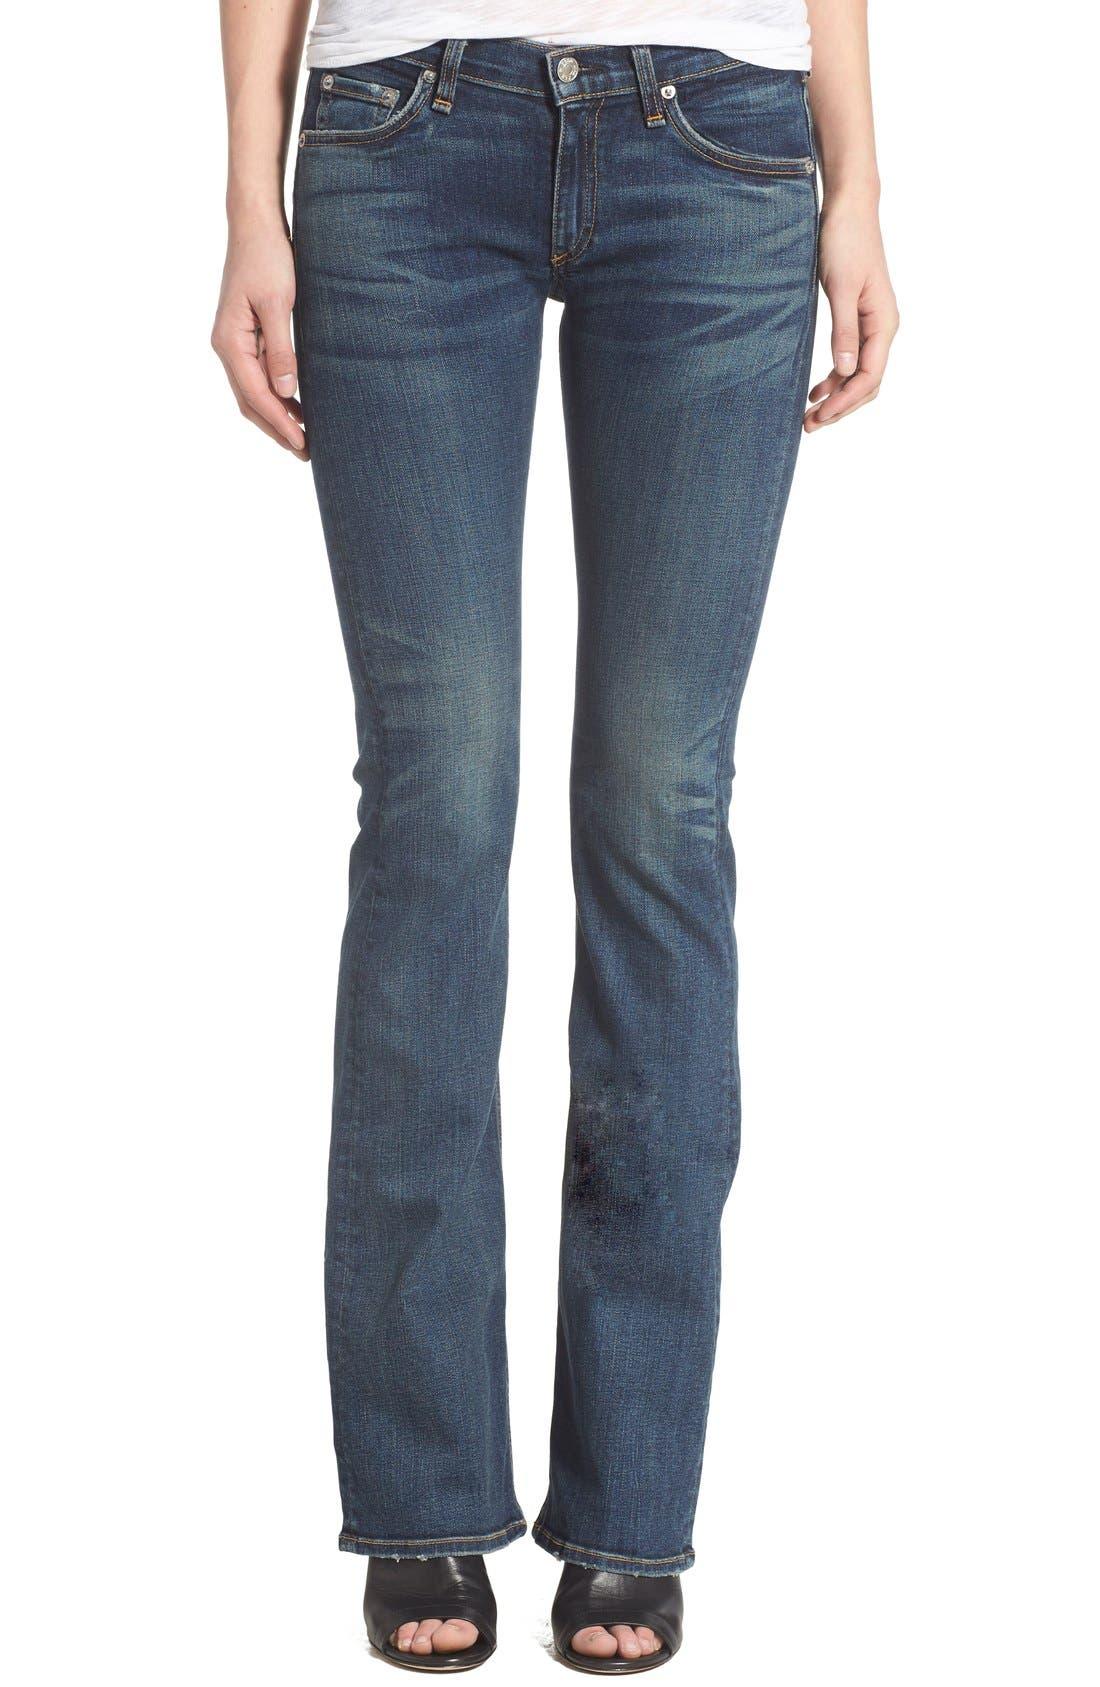 RAG & BONE JEAN Bootcut Jeans, Main, color, 420